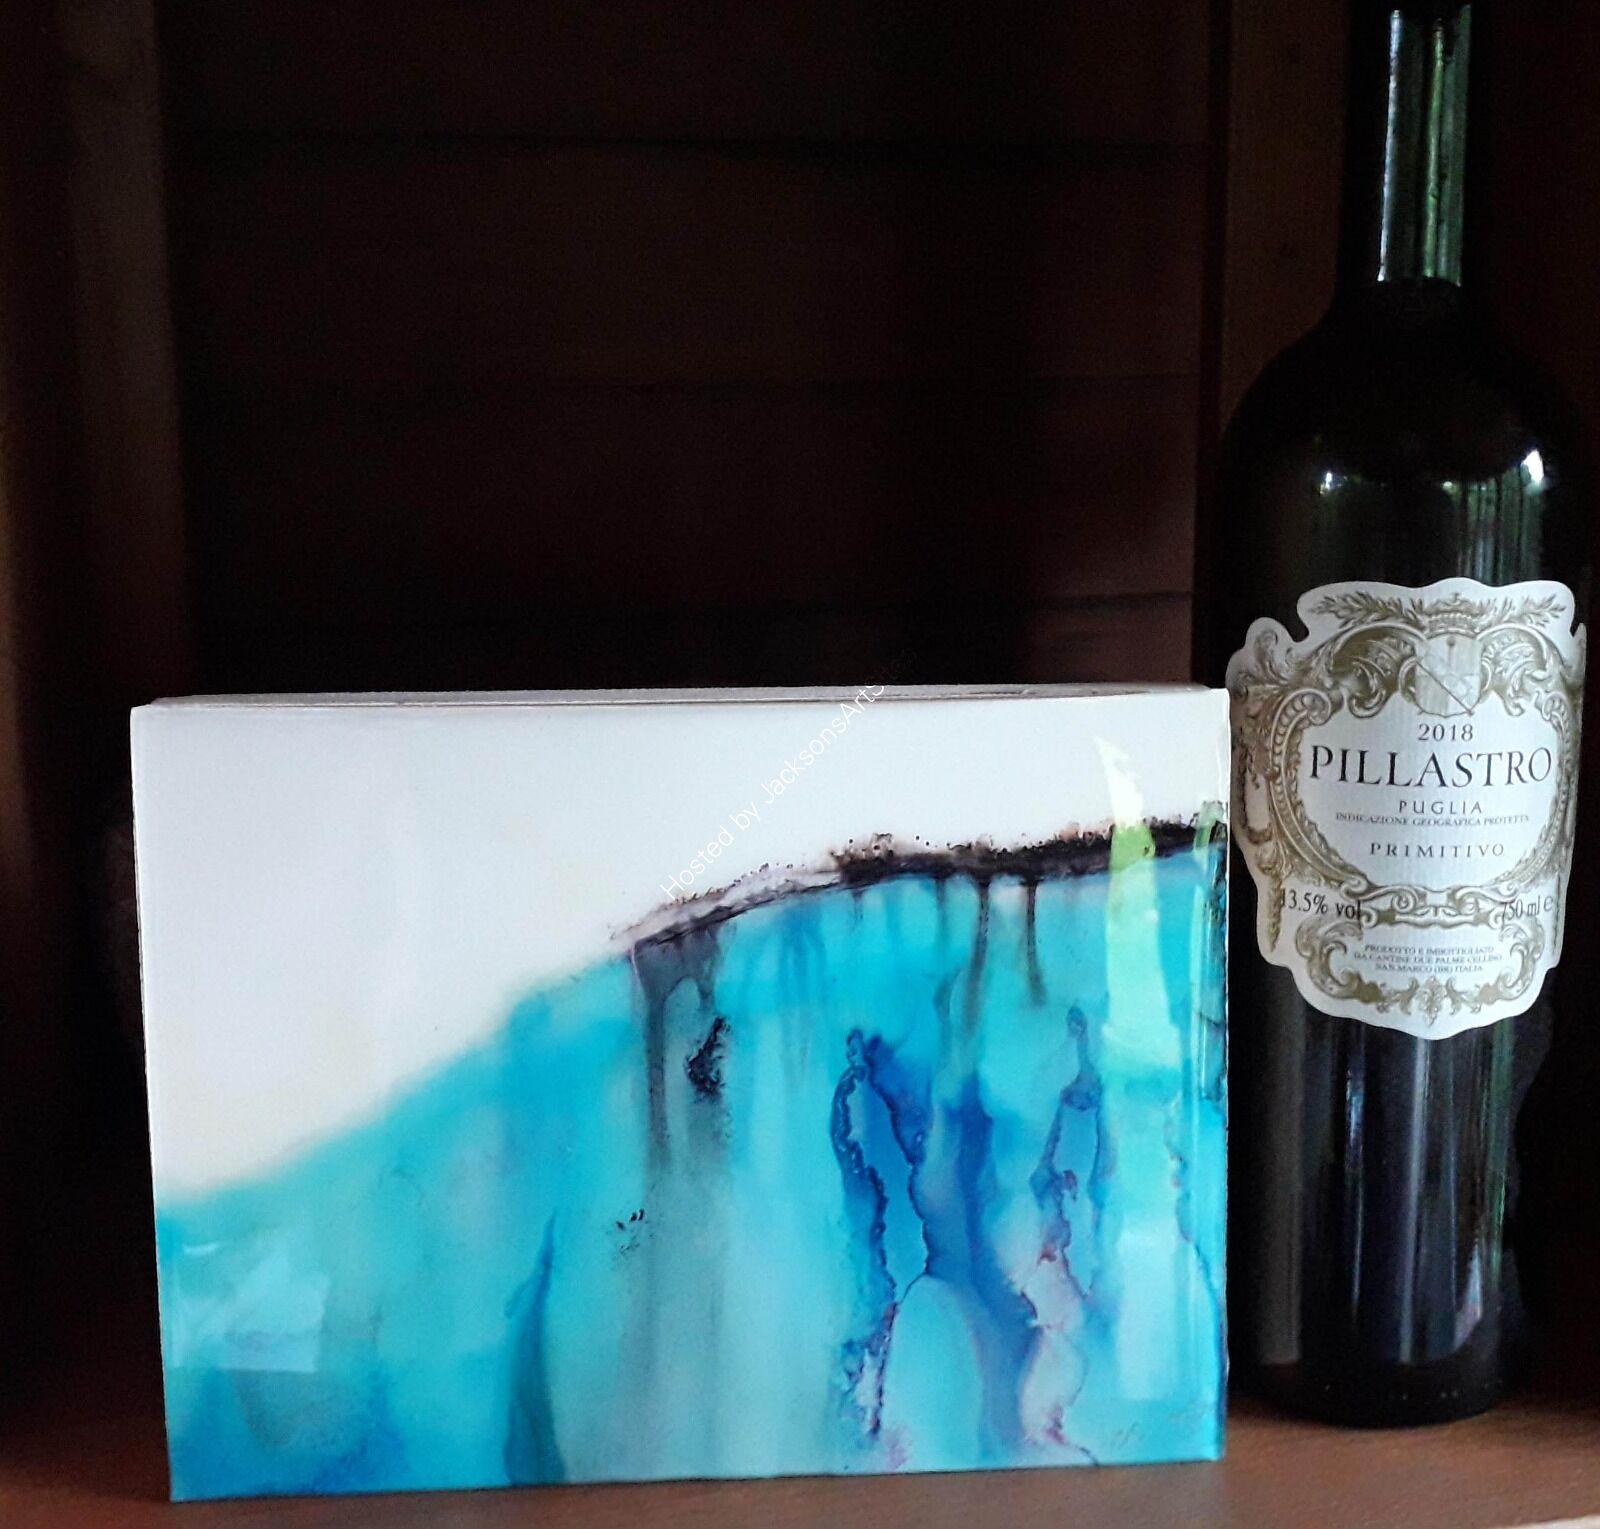 Blue Landscape with wine bottle